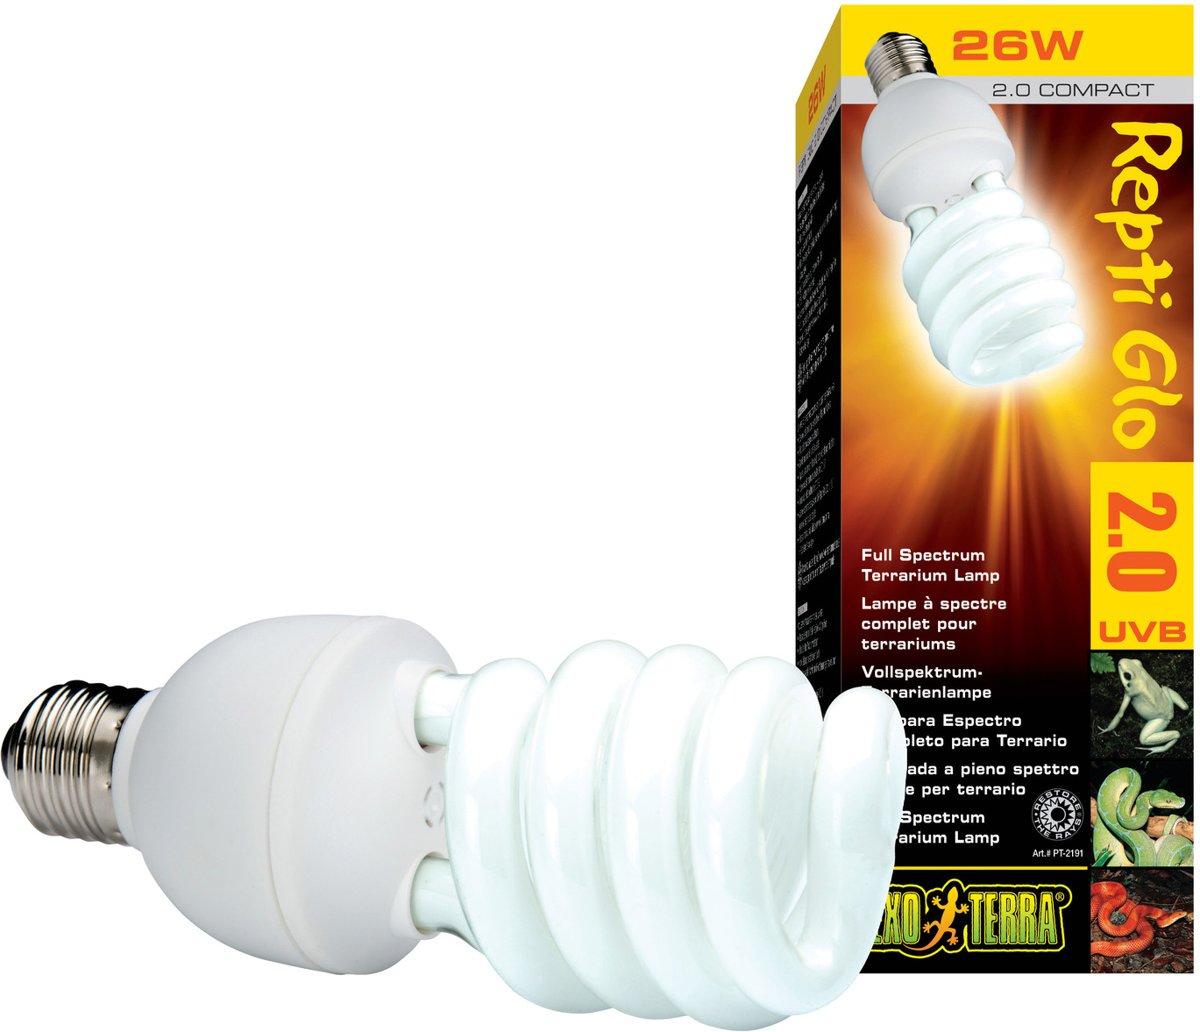 Exo Terra Terrarium verlichting Natural Light 25 watt - Wit - 25w